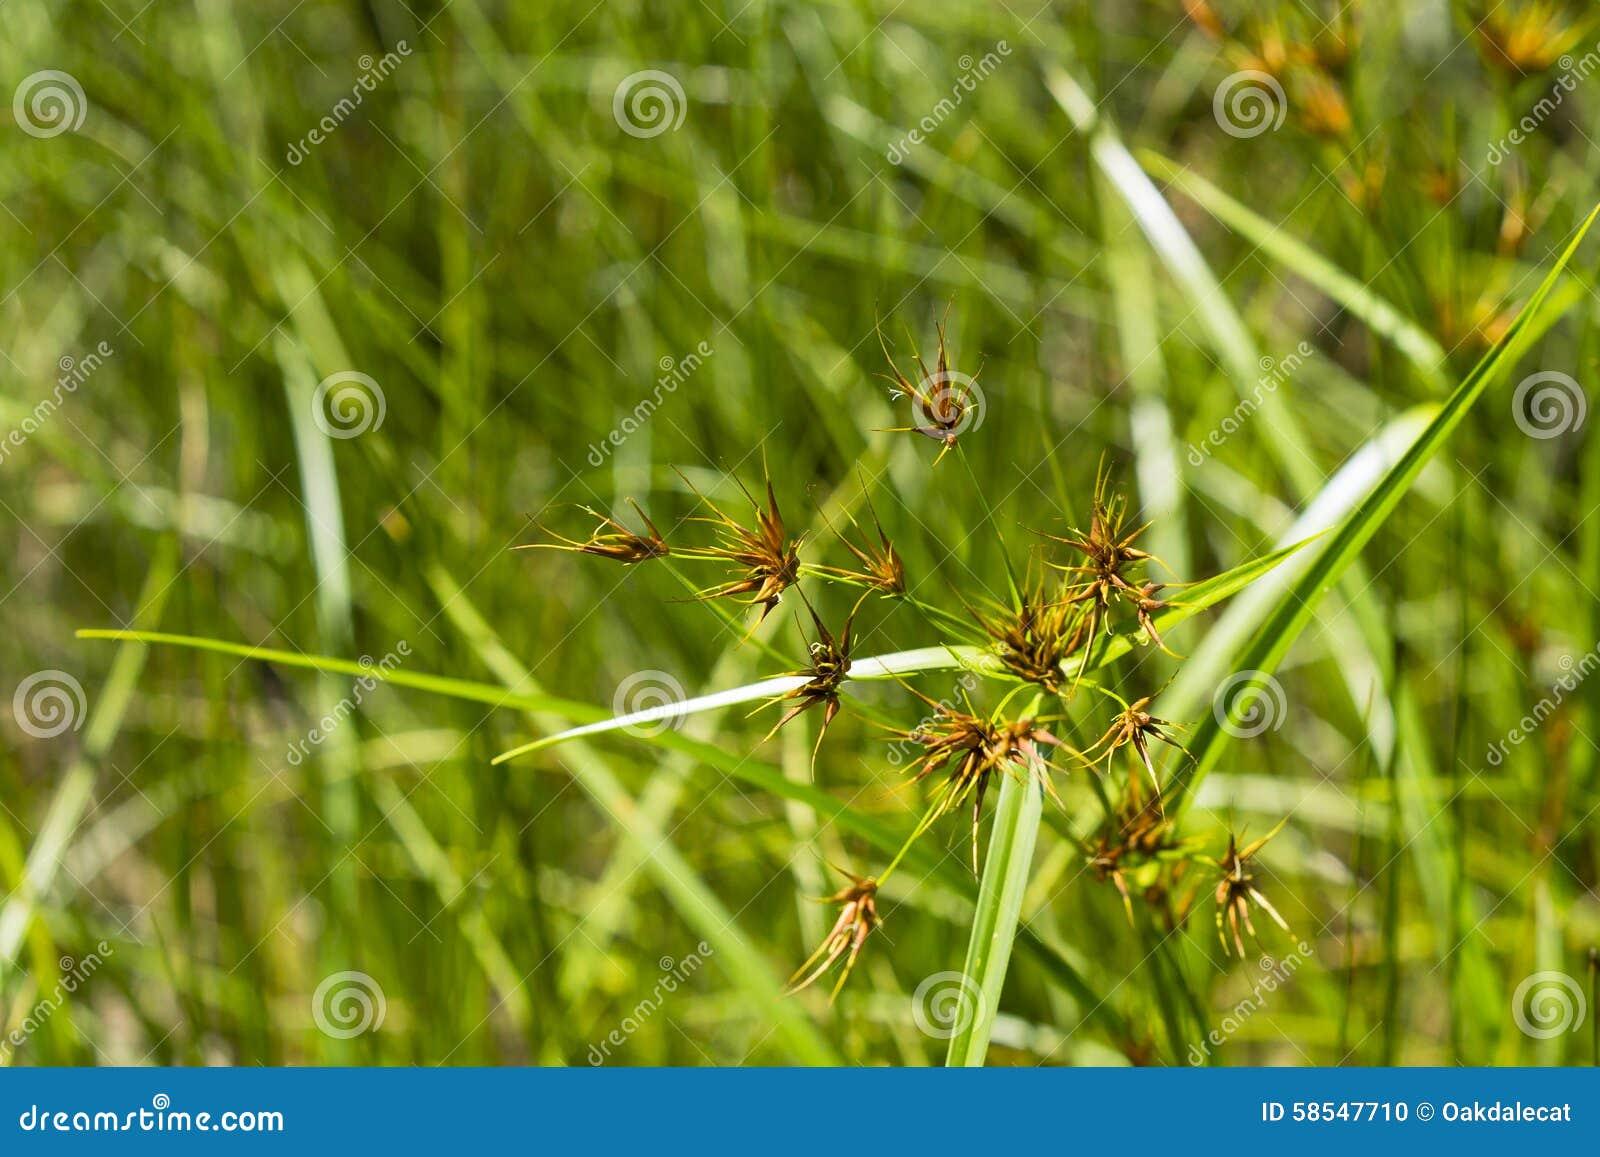 Grass like sedge stock photo image 58547710 for Grass like flowering plants